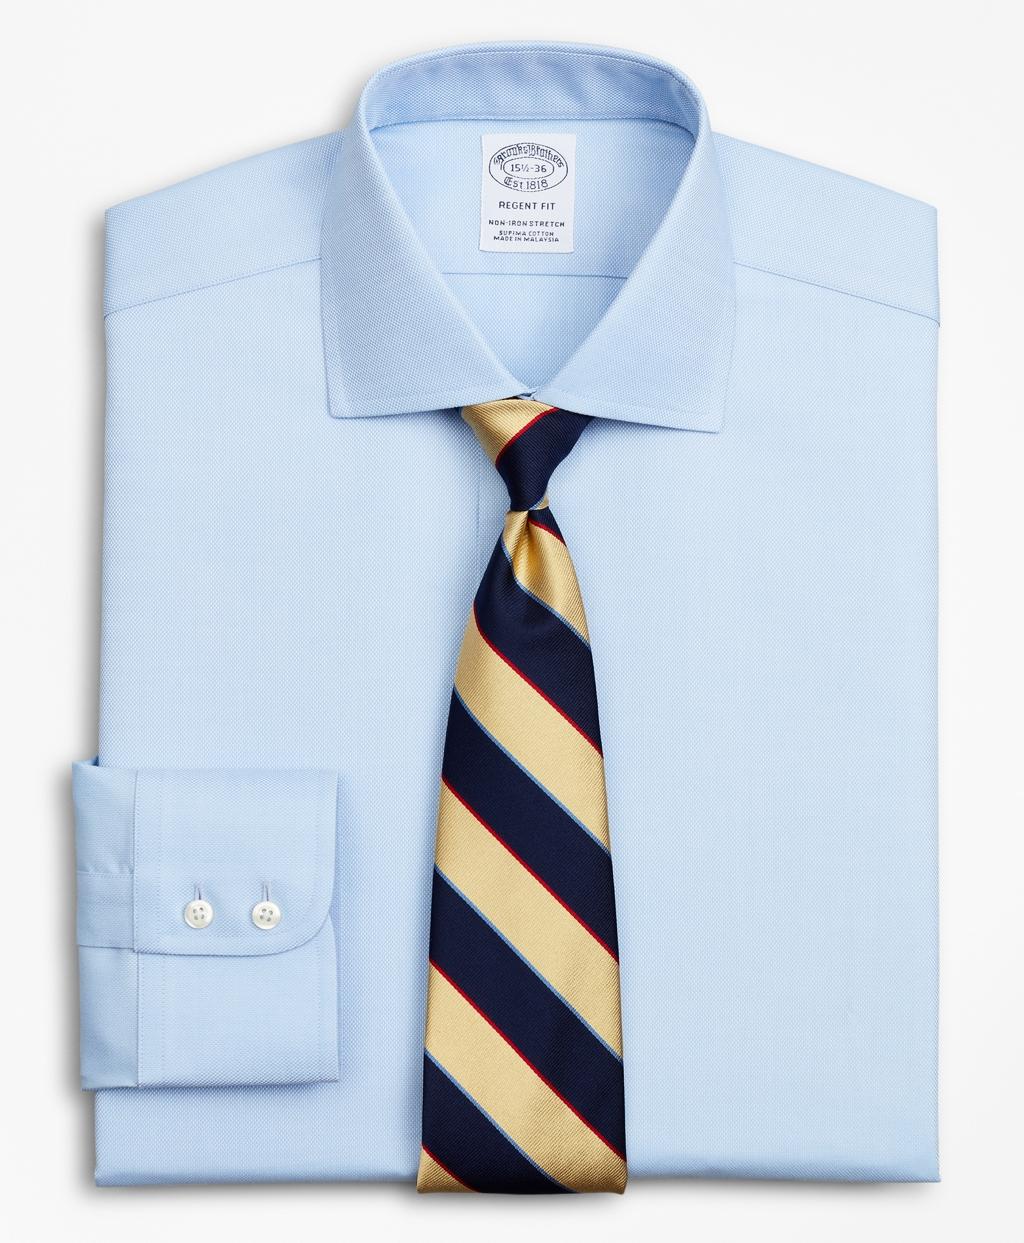 Brooksbrothers Stretch Regent Regular-Fit Dress Shirt, Non-Iron Royal Oxford English Collar